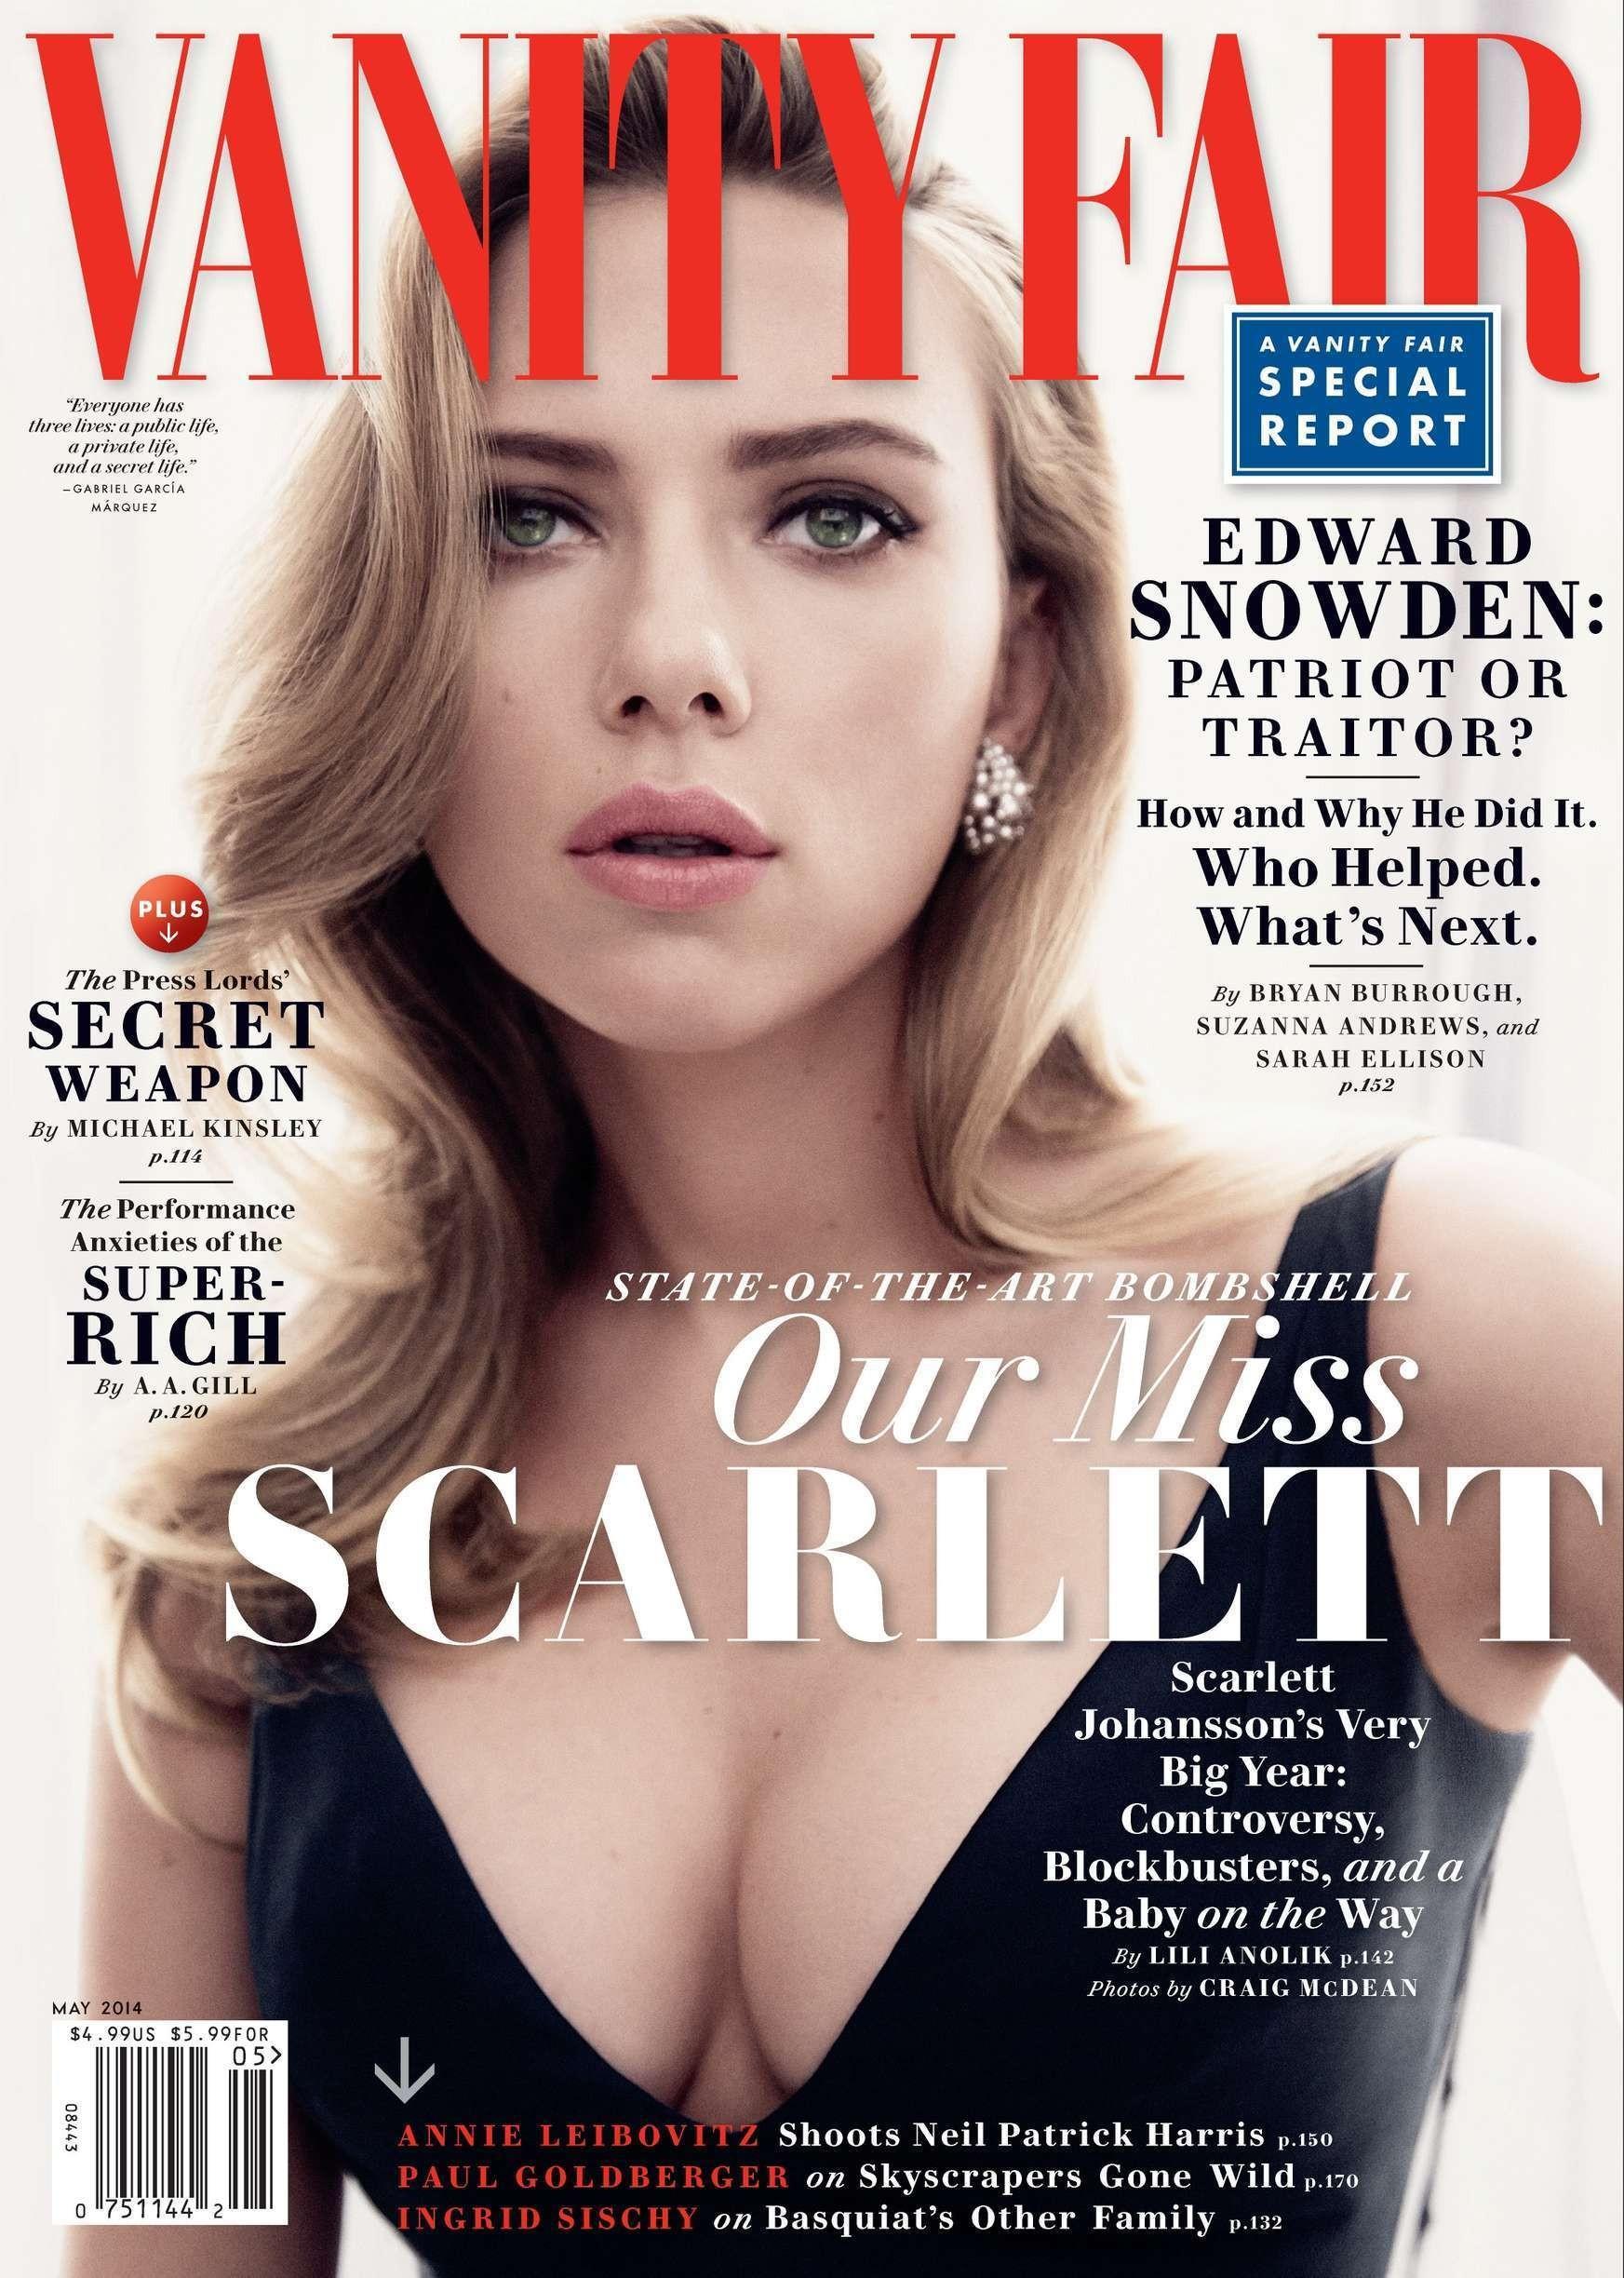 Scarlett johansson для журнала vanity fair май 2014